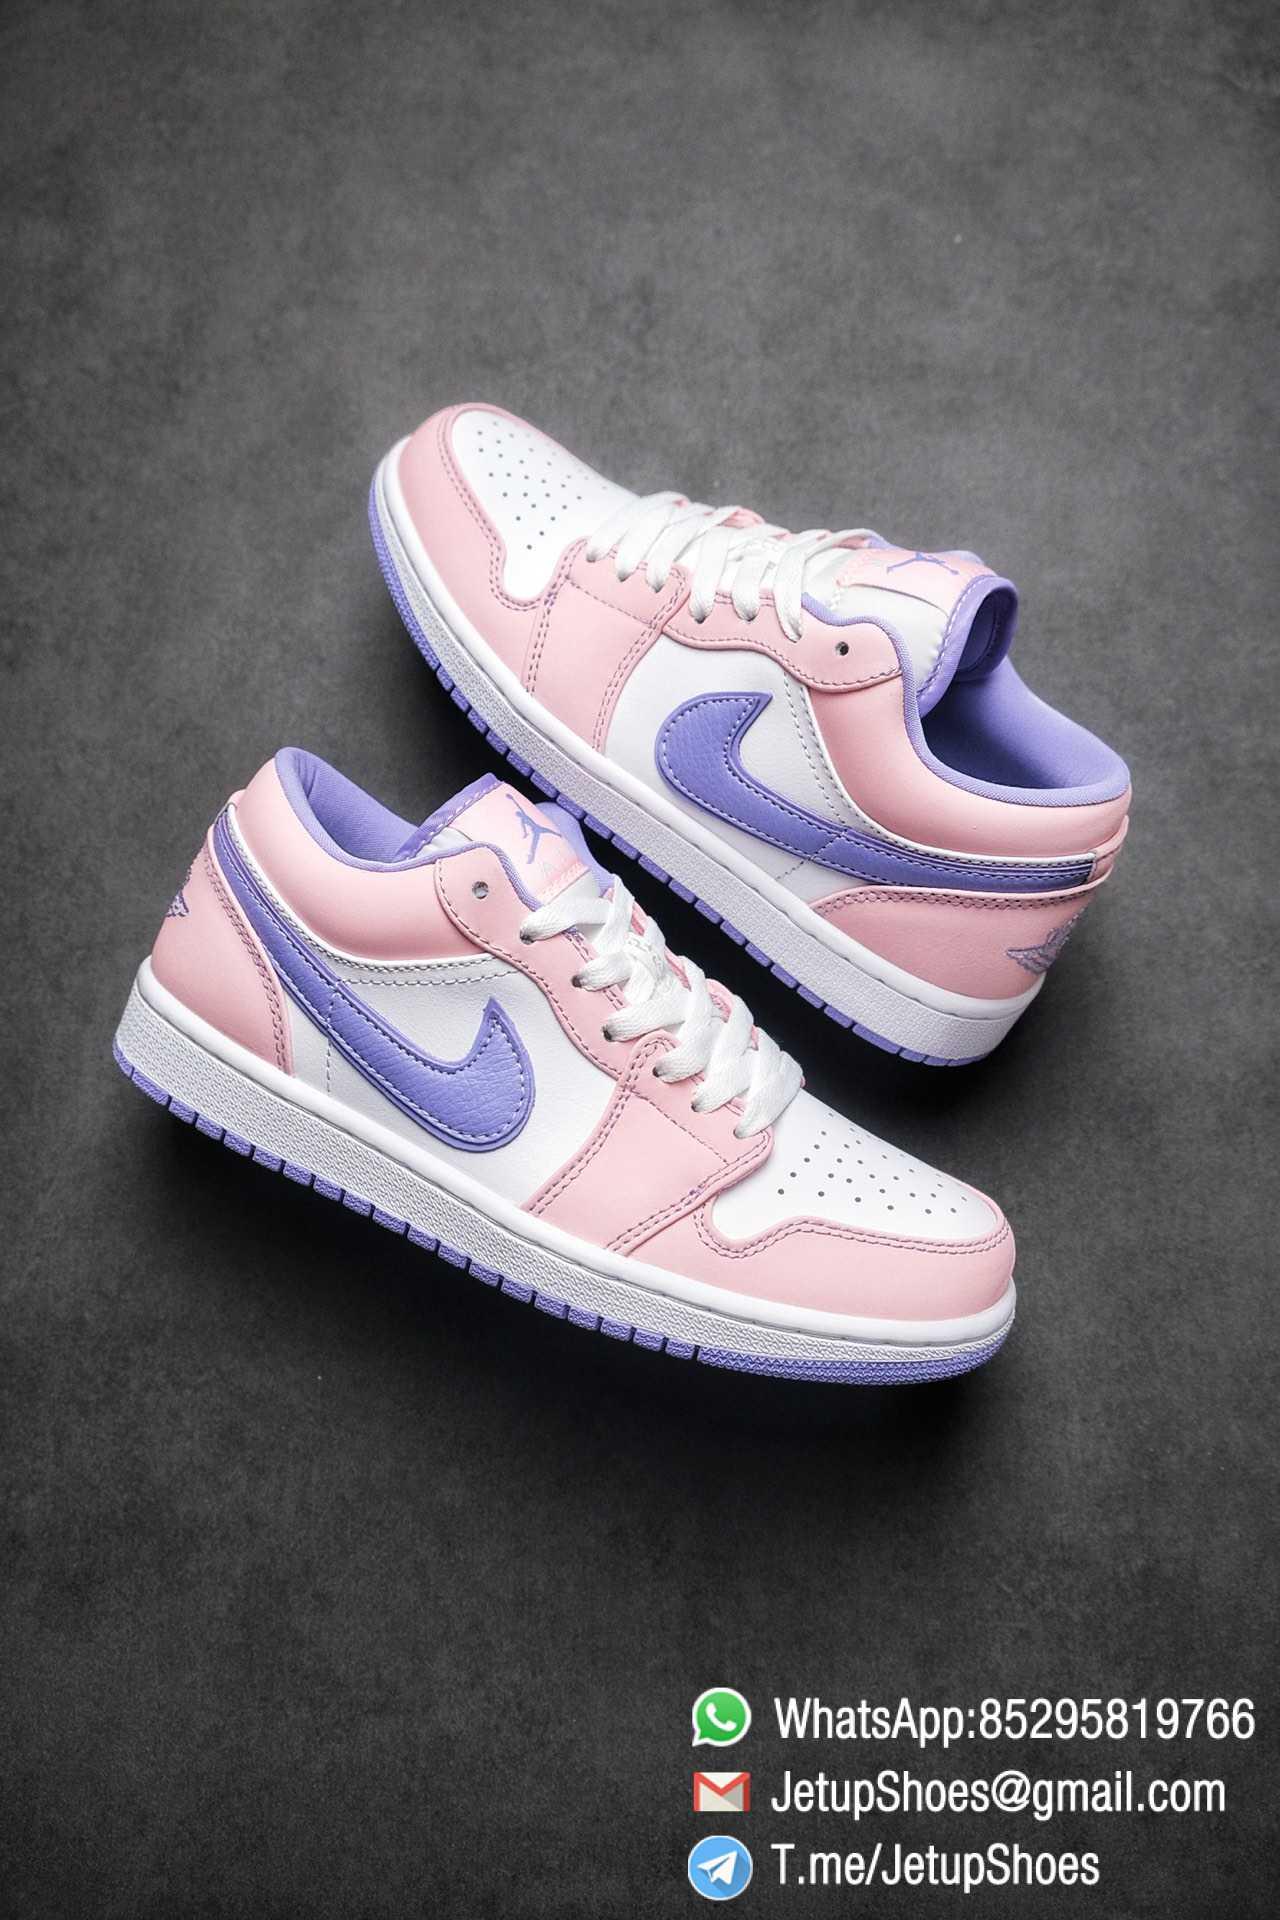 Best Replica Air Jordan 1 Low SE Arctic Punch Crisp White Upper Soft Pink Overlays Top Quality Supplier 01